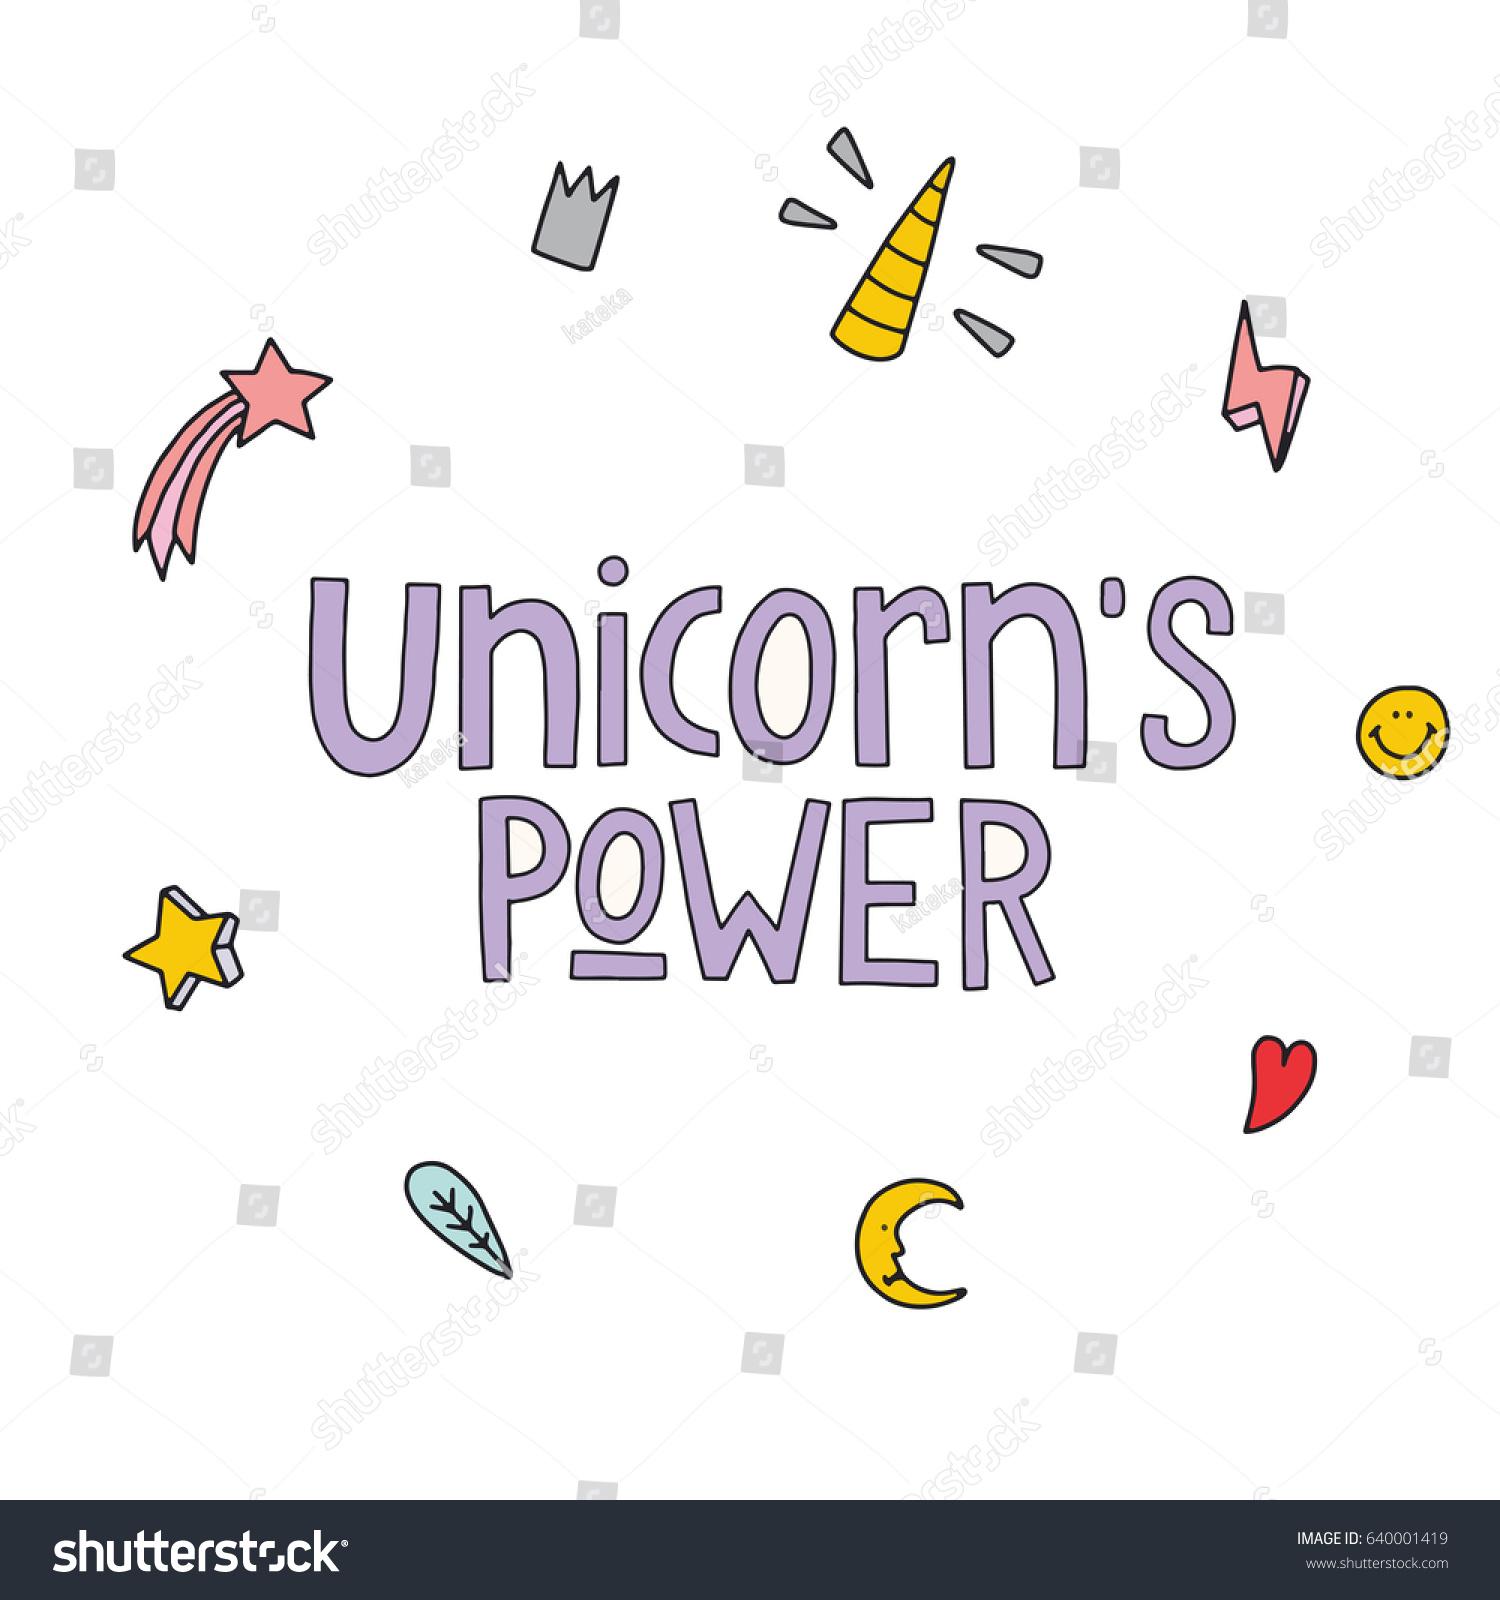 Unicorns power hand drawn quote vector stock vector 640001419 unicorns power the hand drawn quote vector illustration of magic and unicorns symbols biocorpaavc